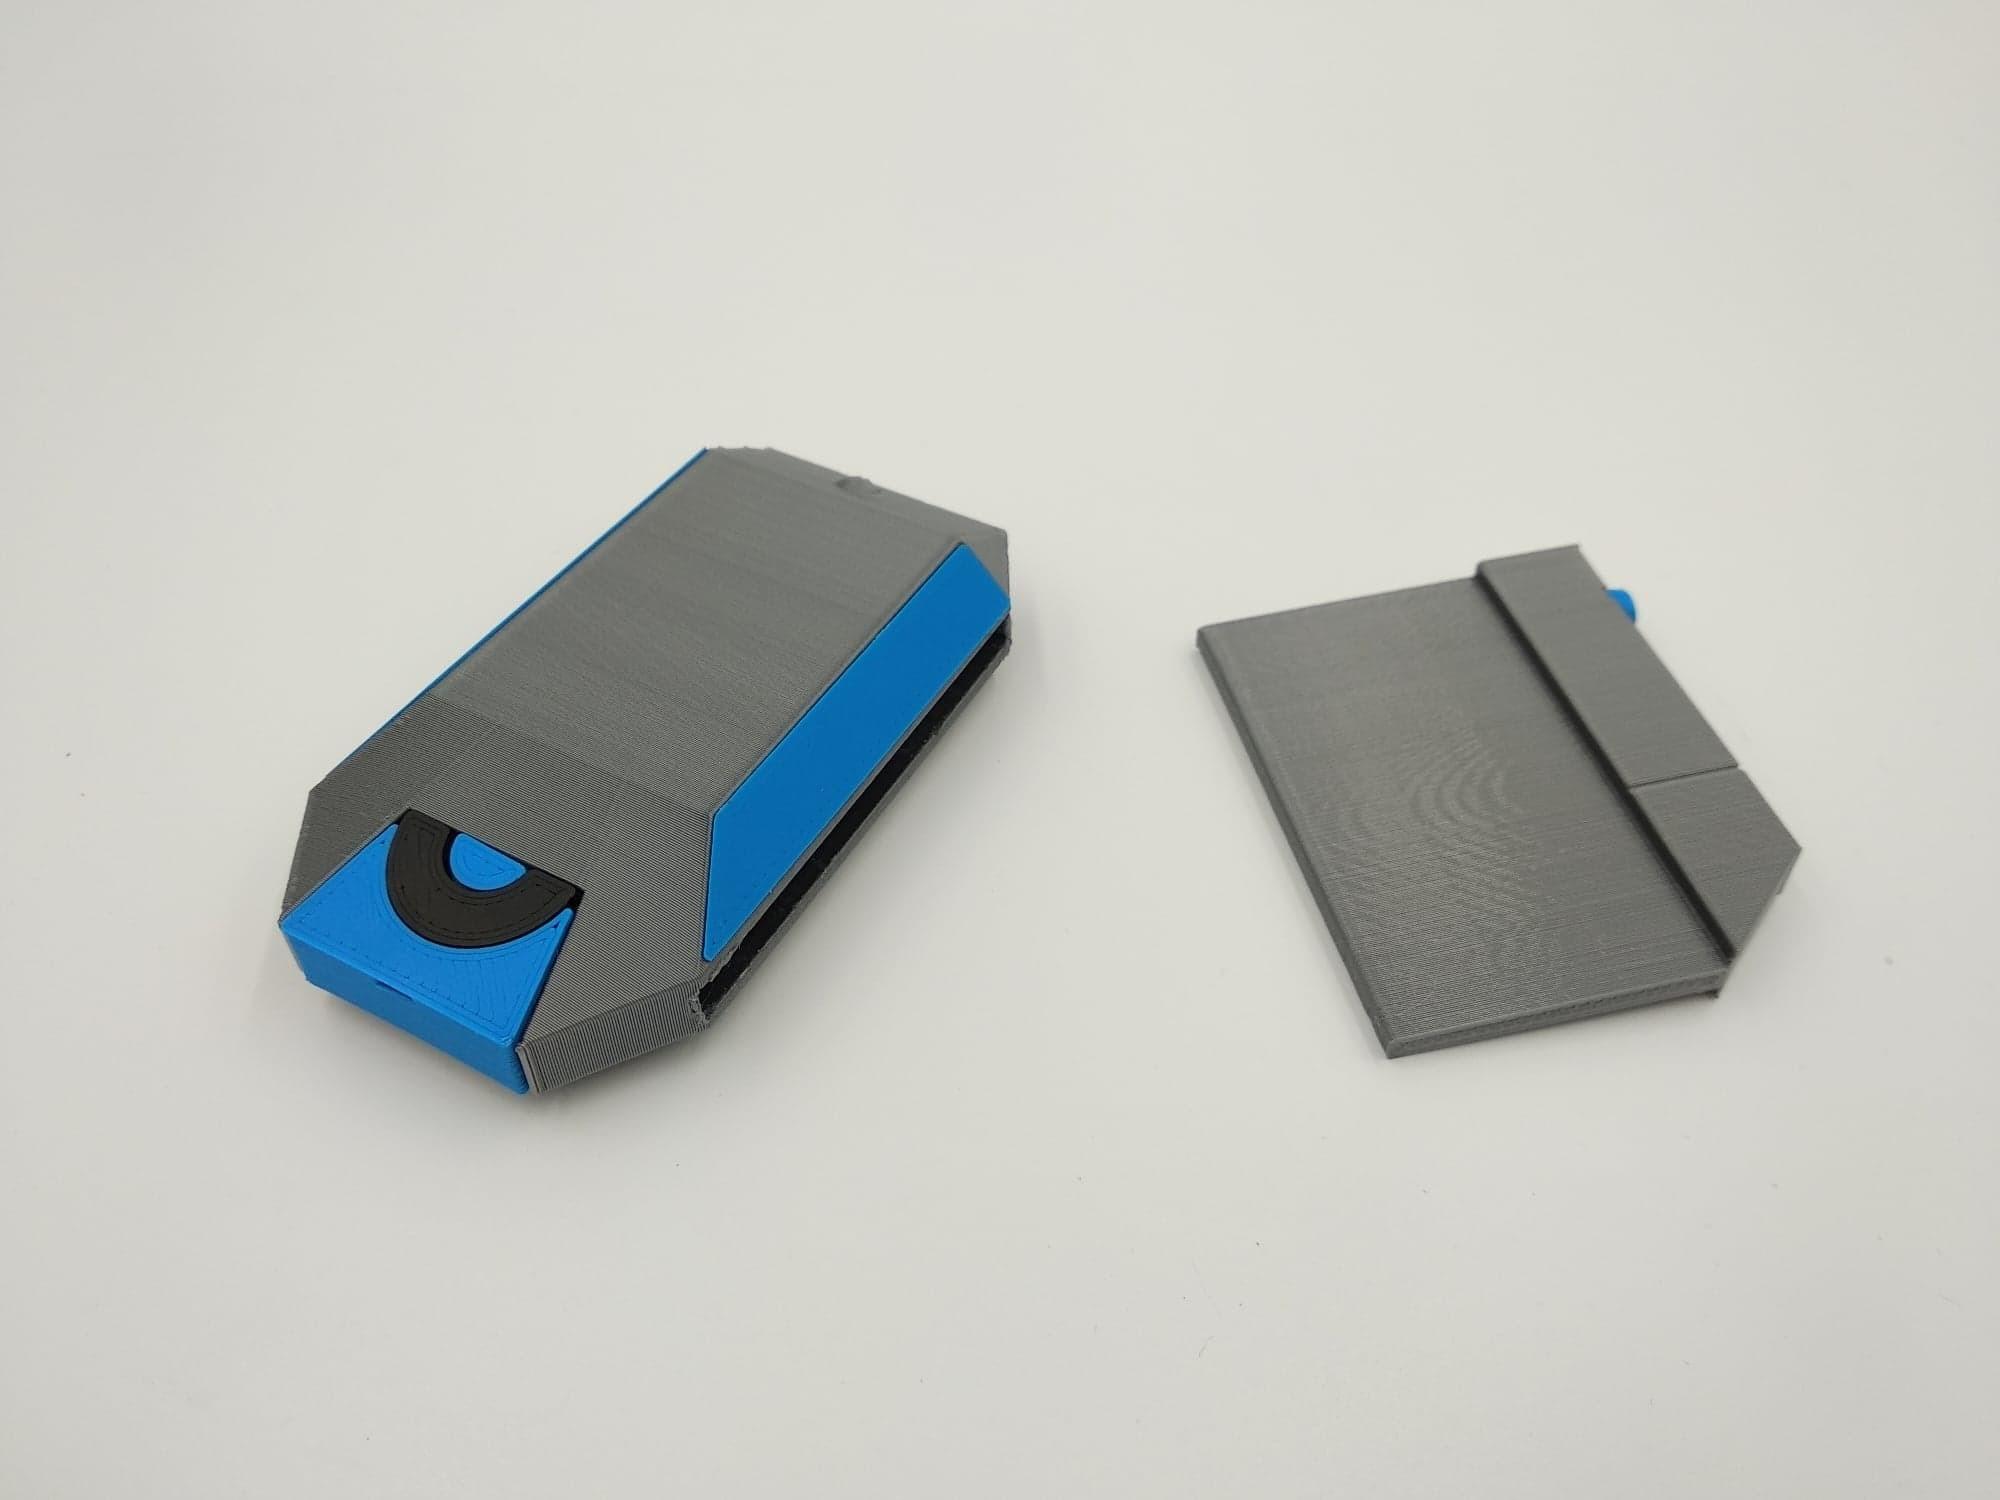 36270226_236334870490580_8916033578836426752_n.jpg Download STL file Pokemon Xtransceiver 3D print model • 3D print model, 3D-mon